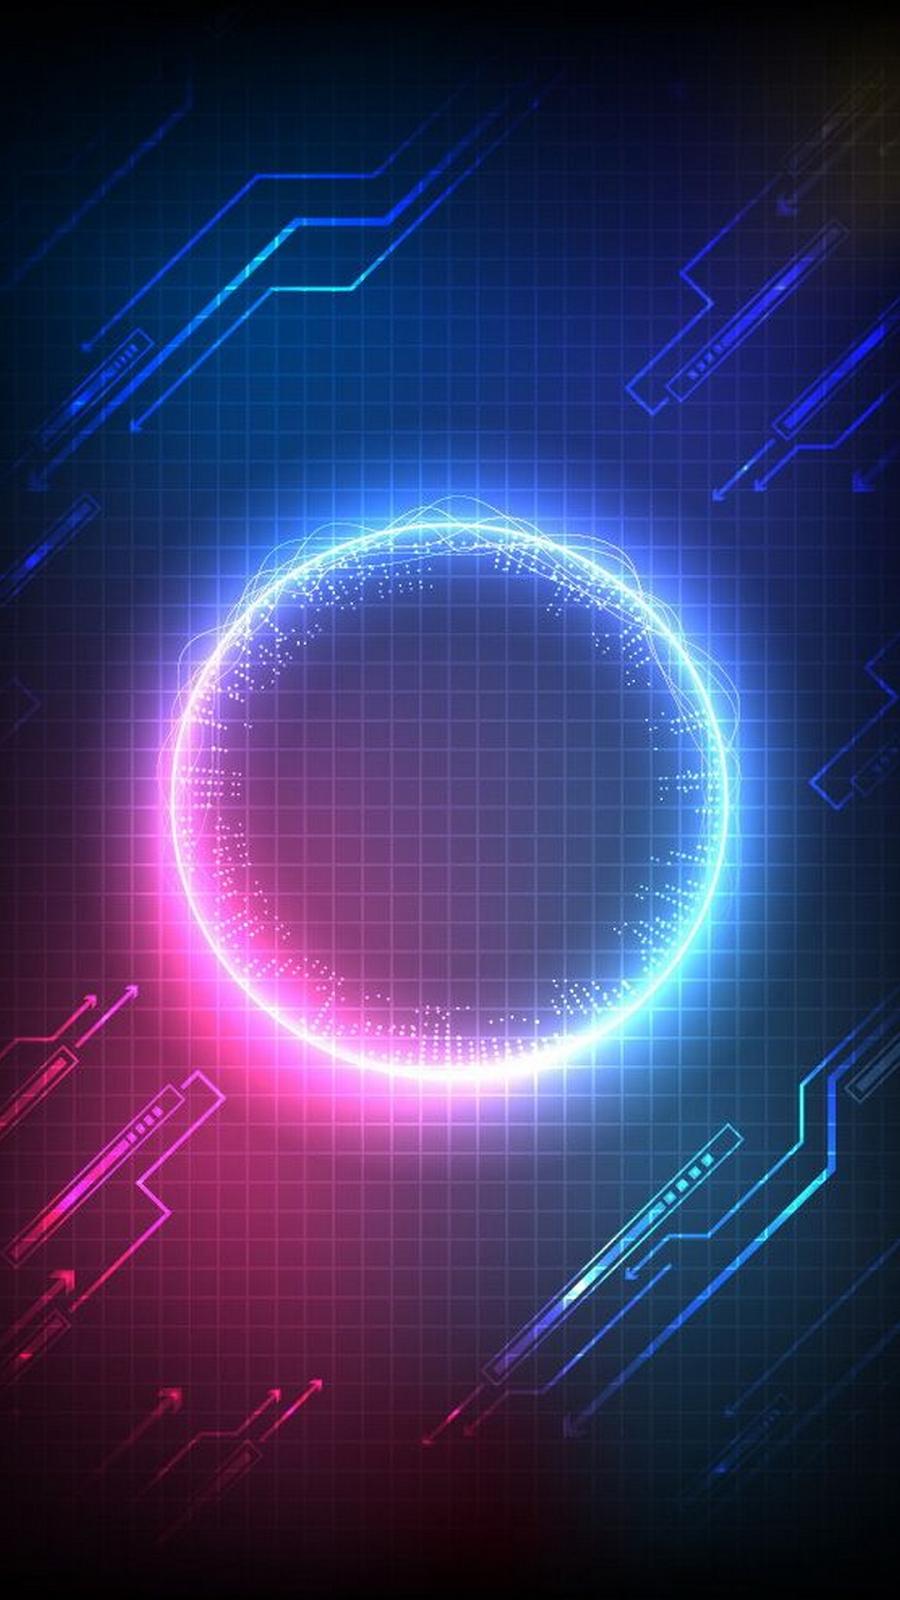 Blue Light Neon Electric Blue Design Line Technology Wallpaper Poster Background Design Abstract Iphone Wallpaper